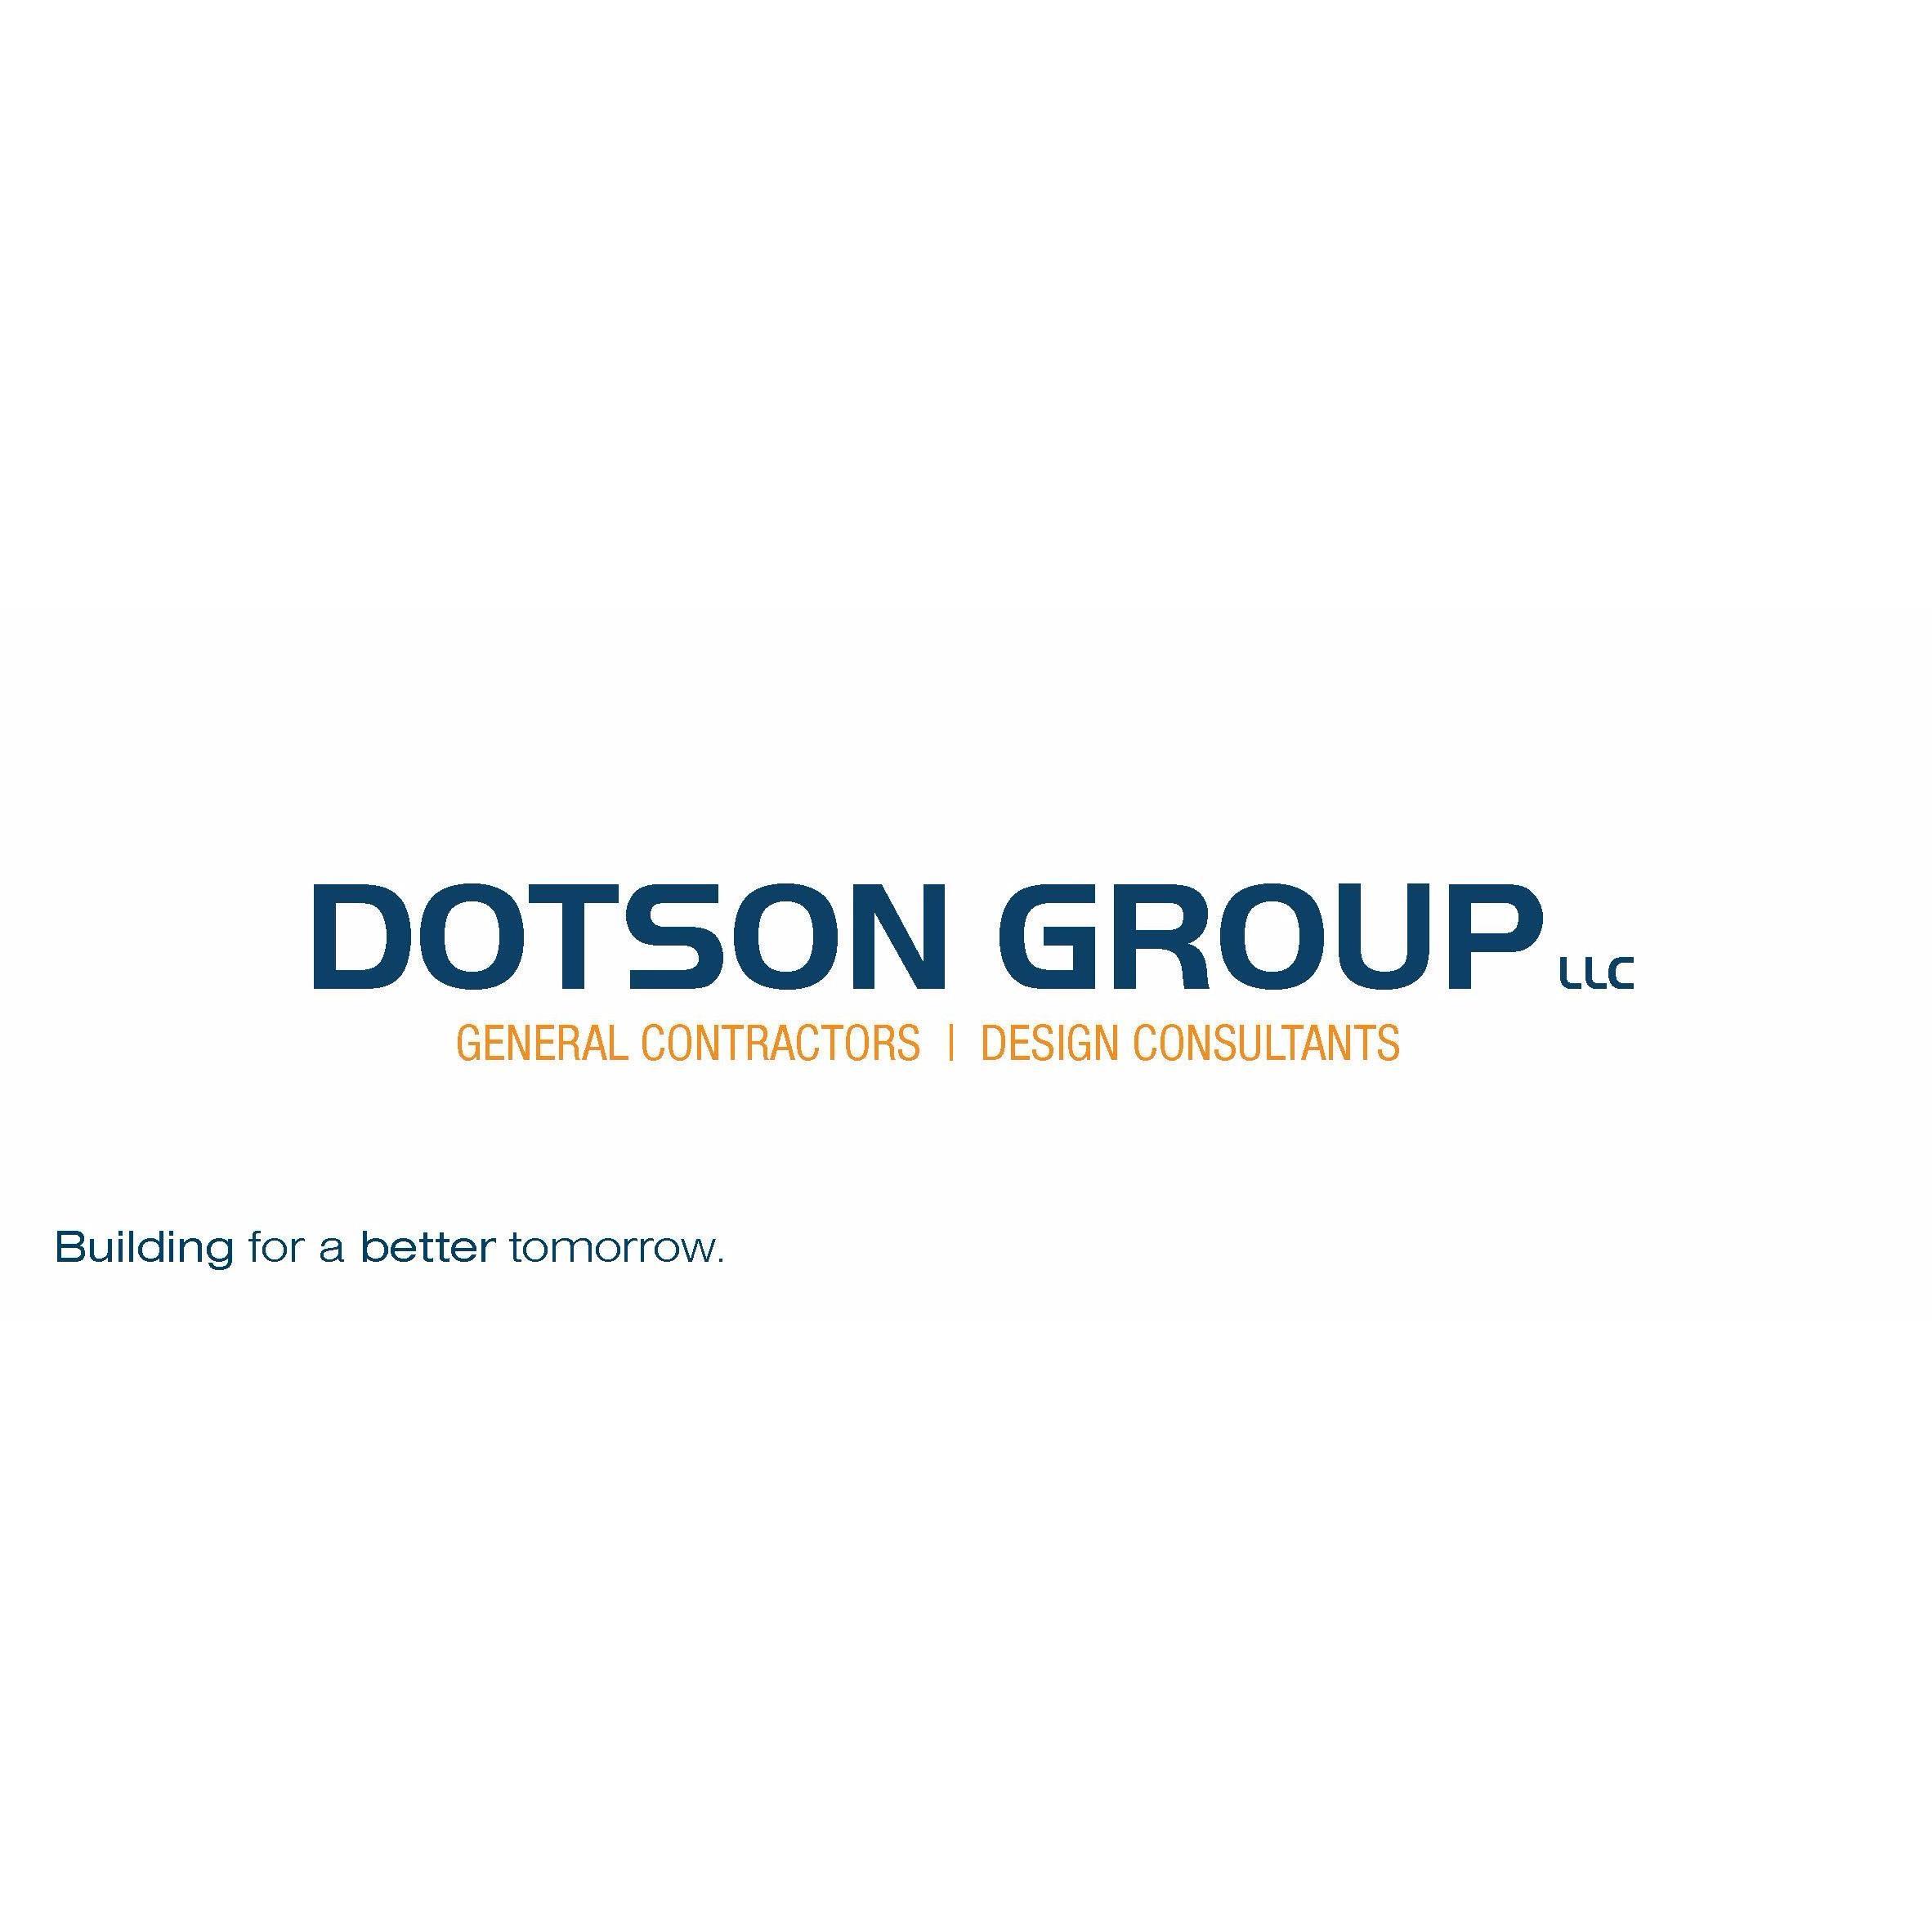 Dotson Group LLC